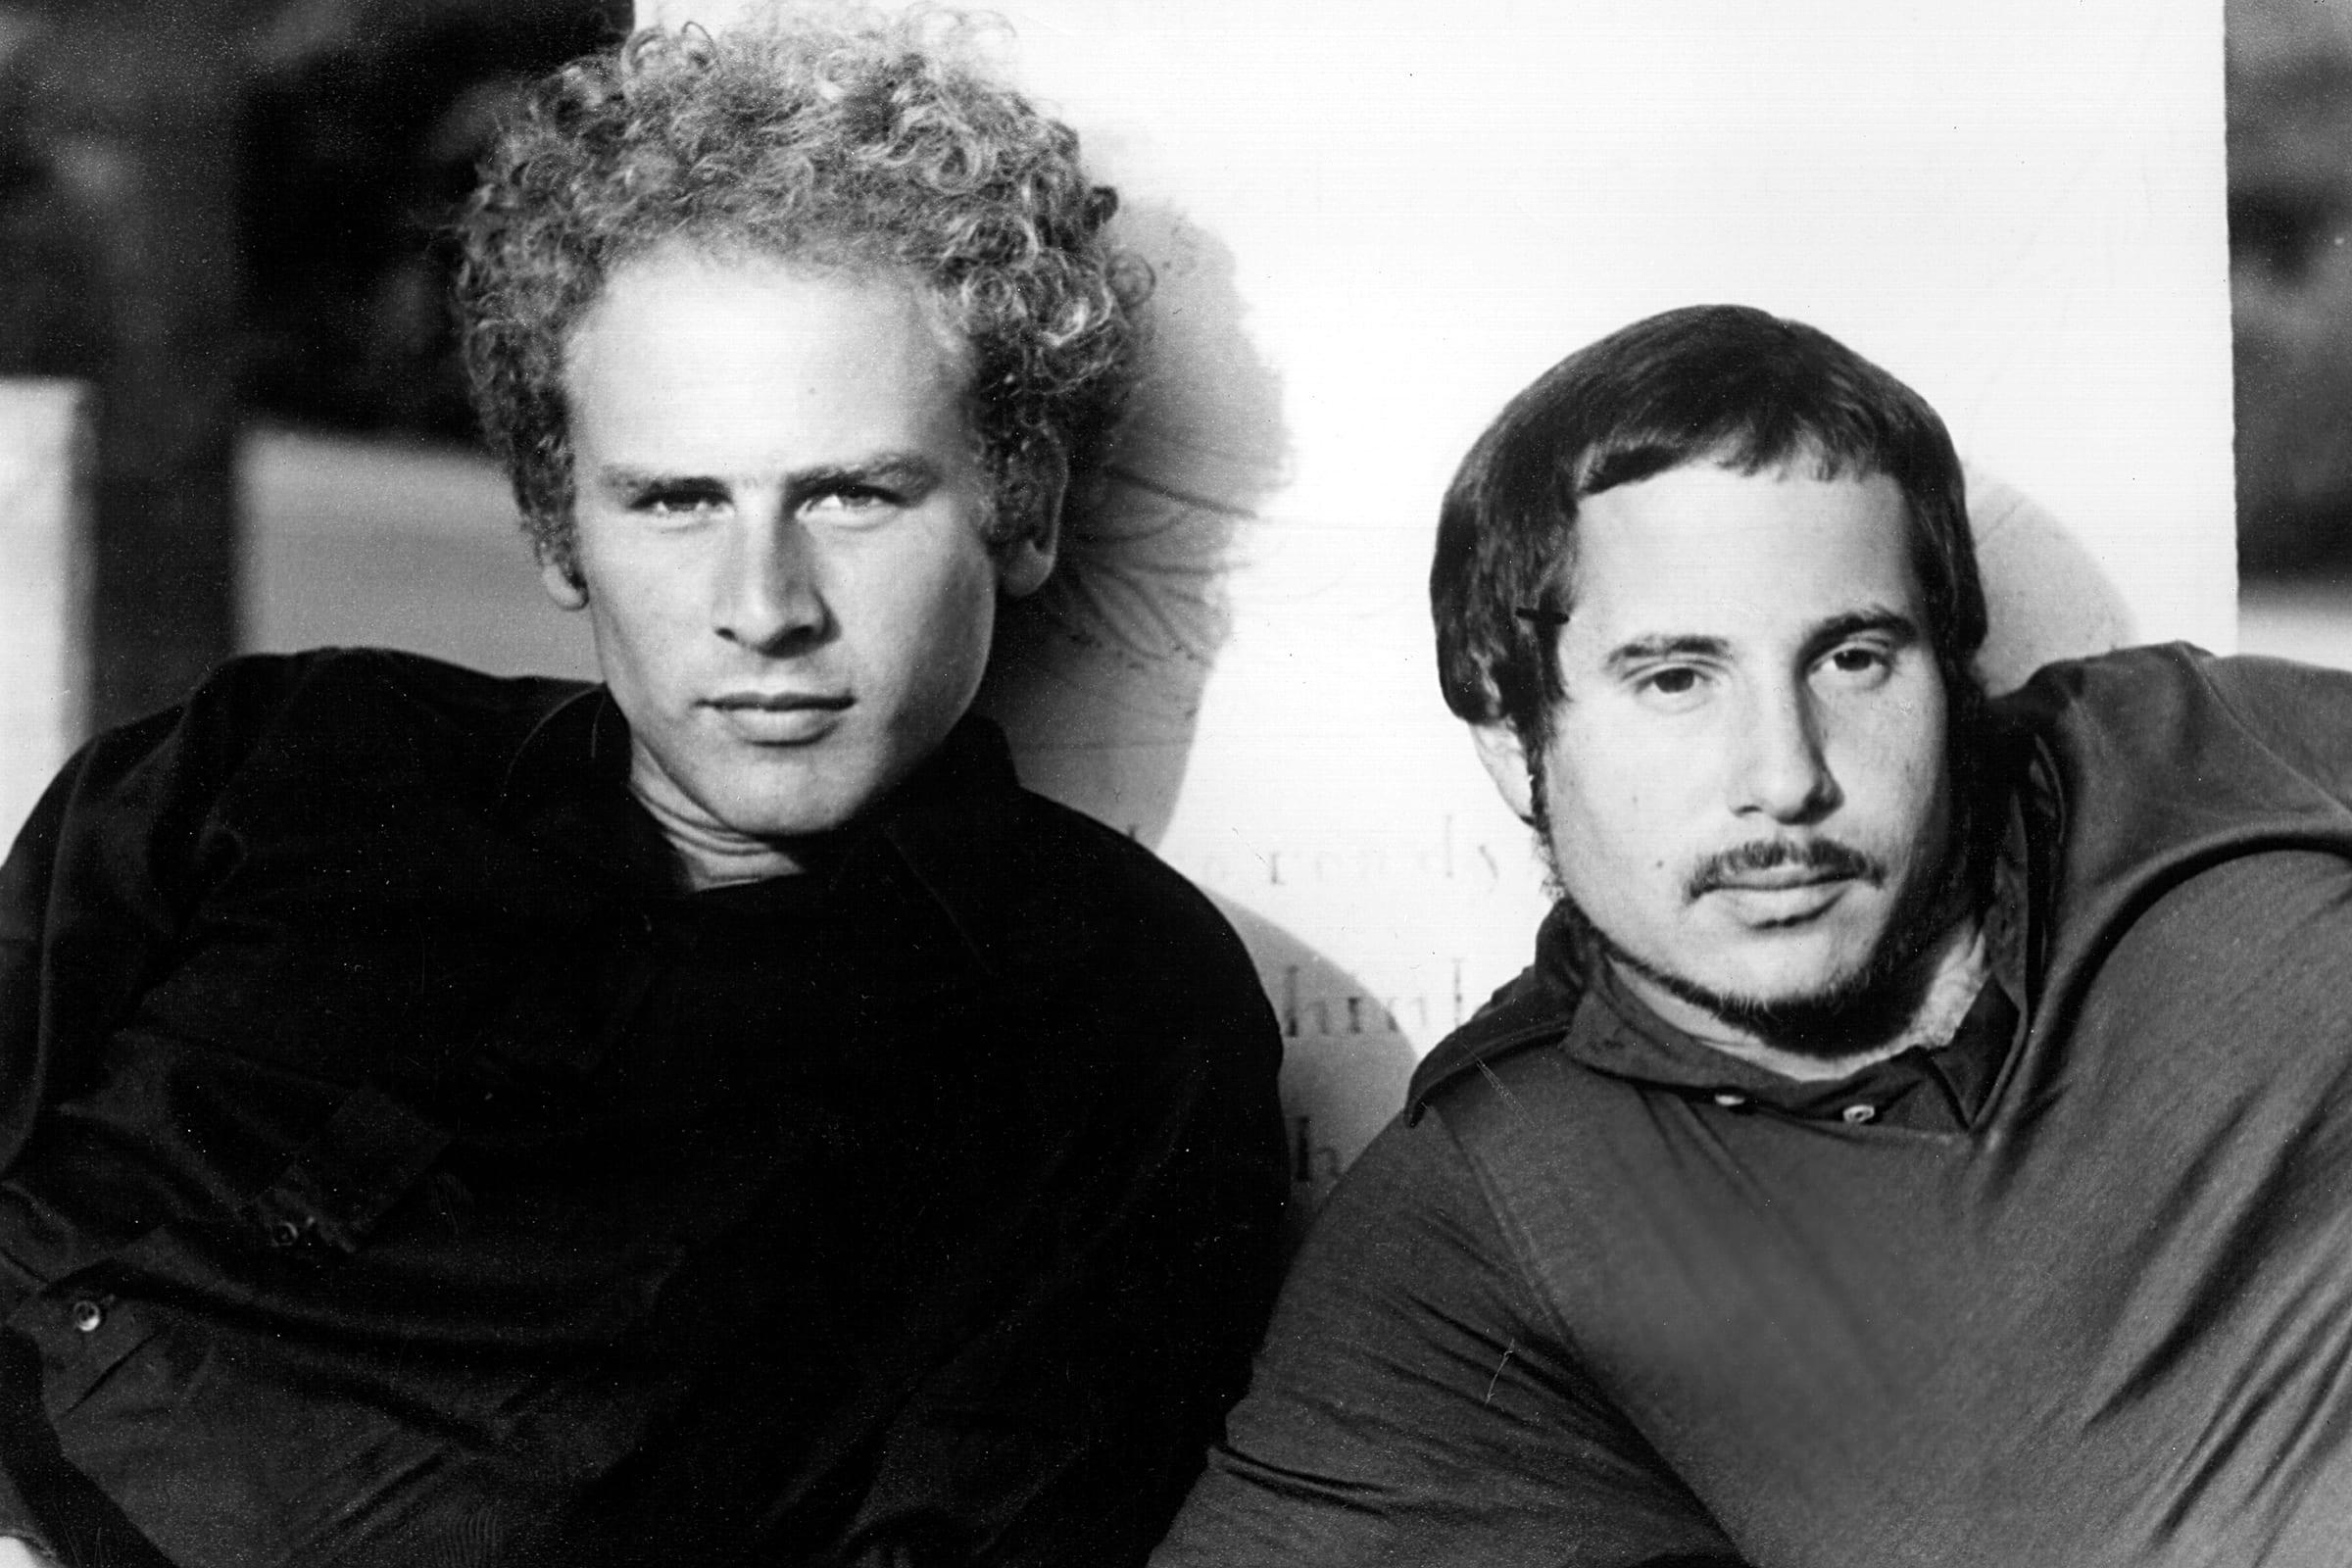 Why did Simon and Garfunkel split?